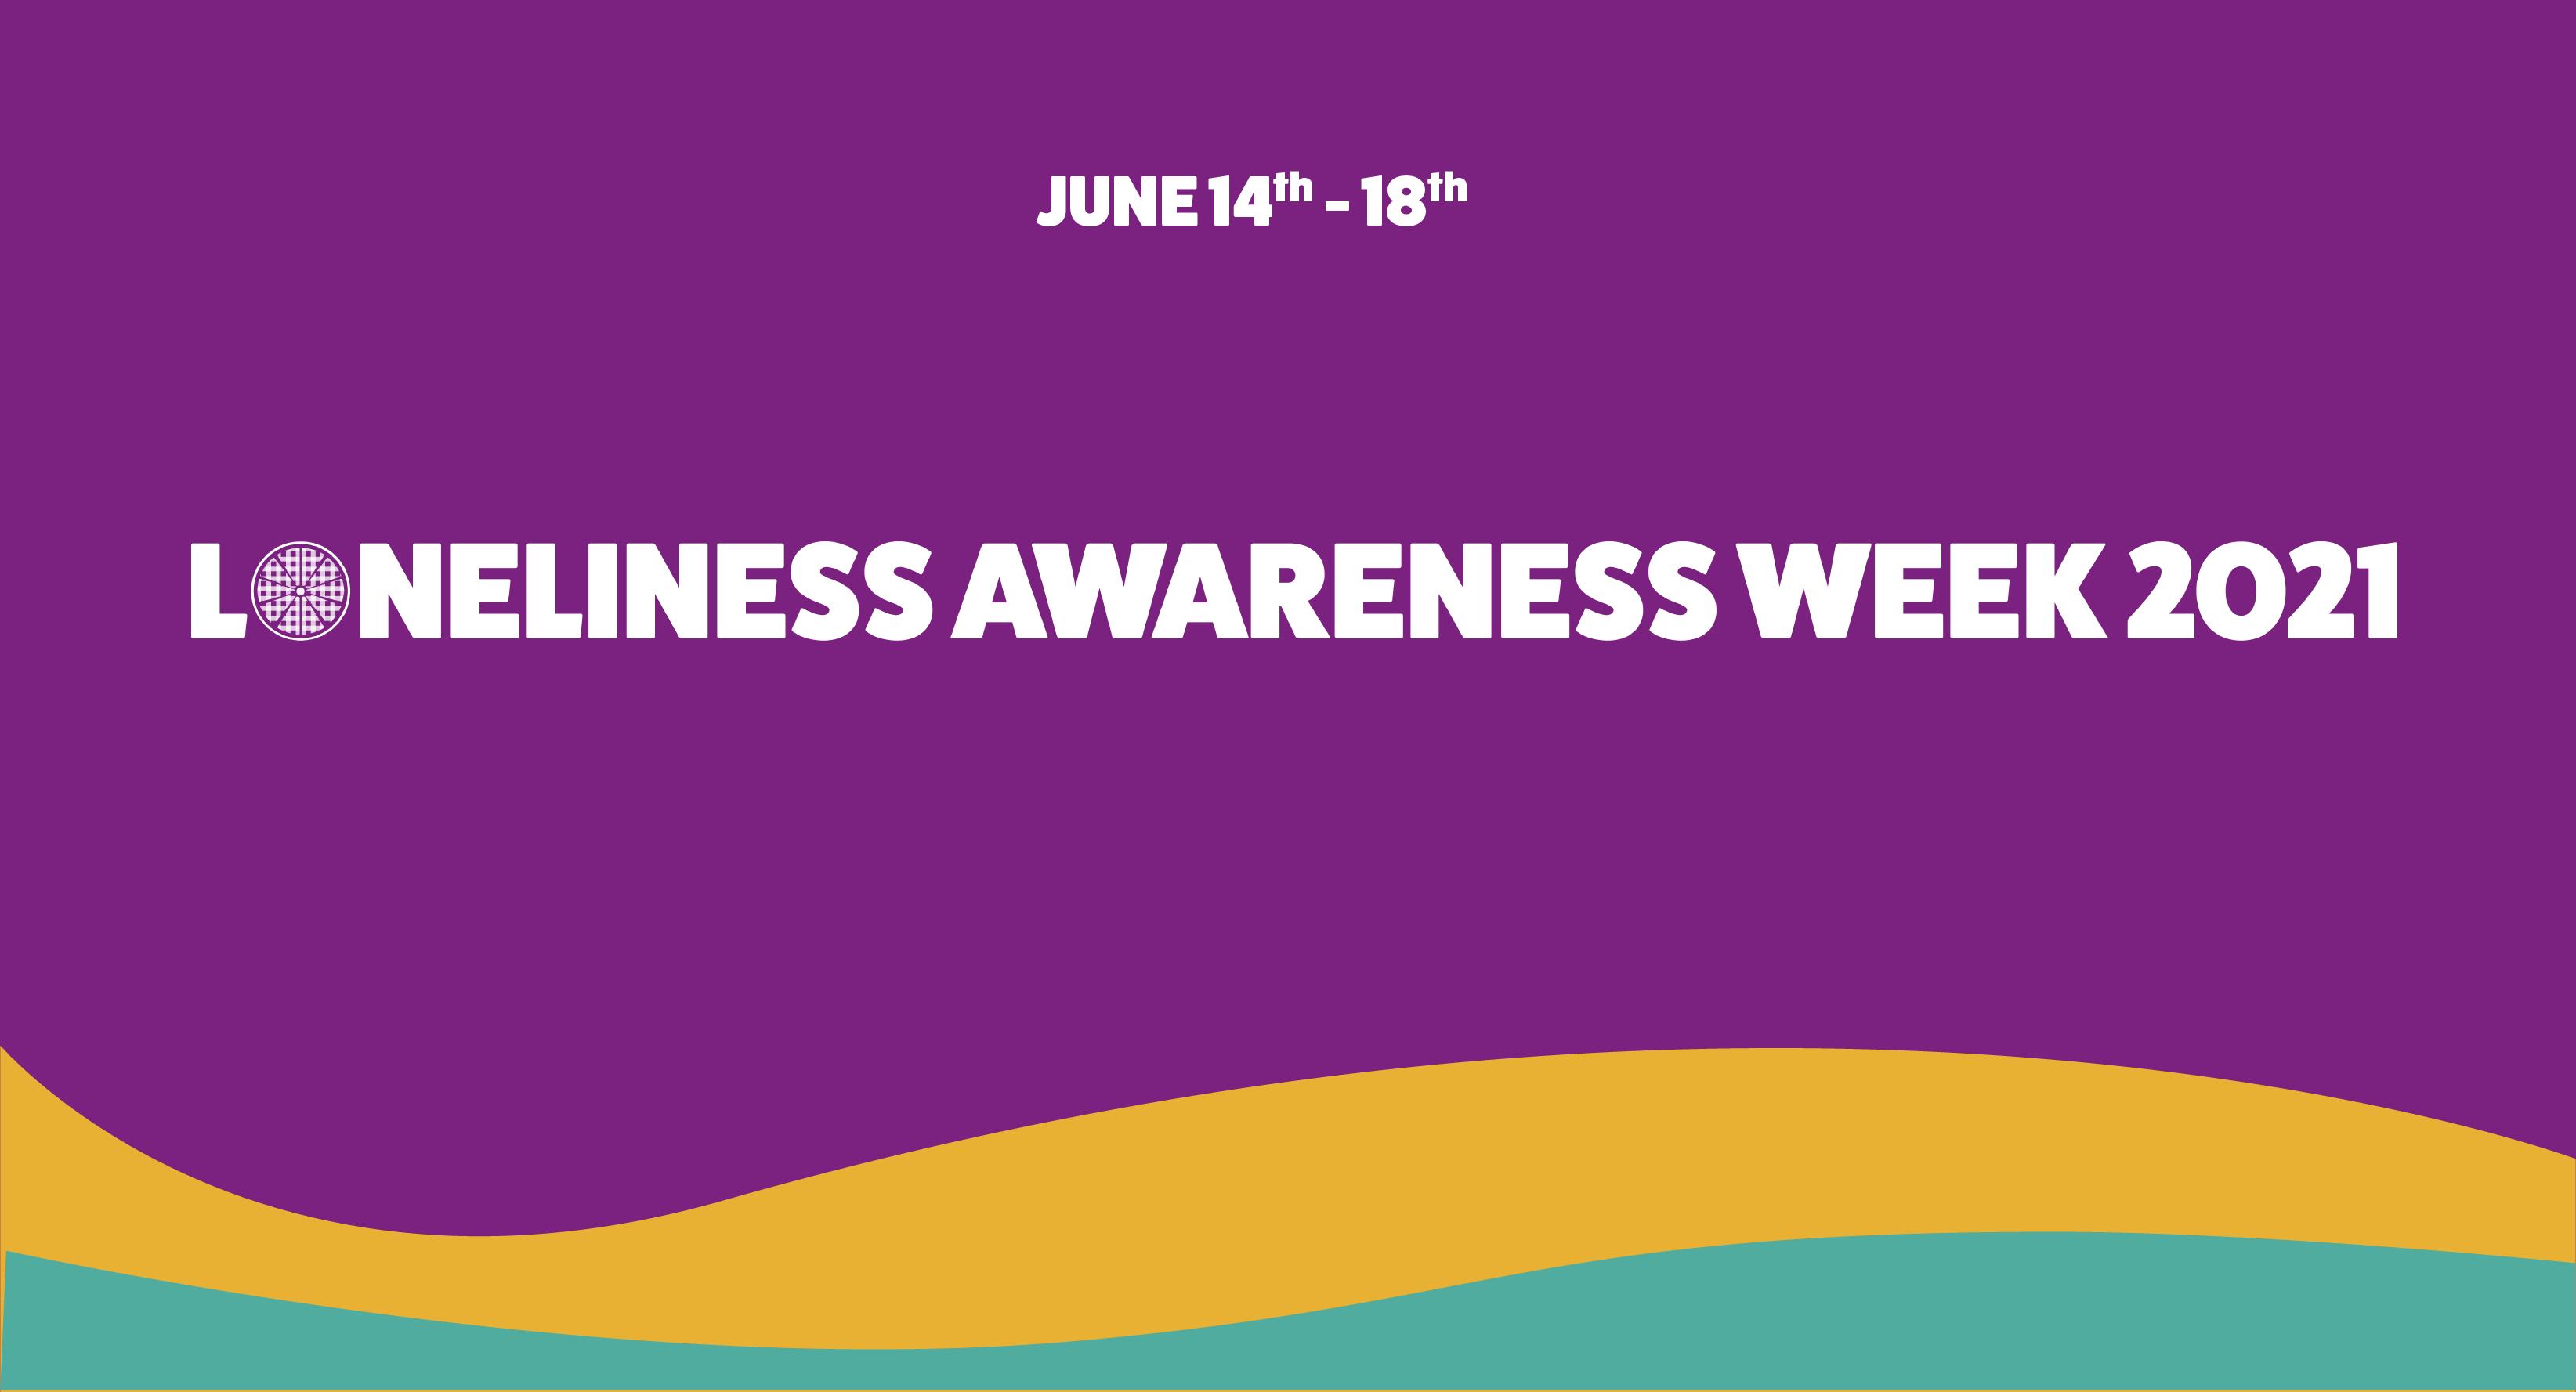 Loneliness Awareness Week 2021 Logo